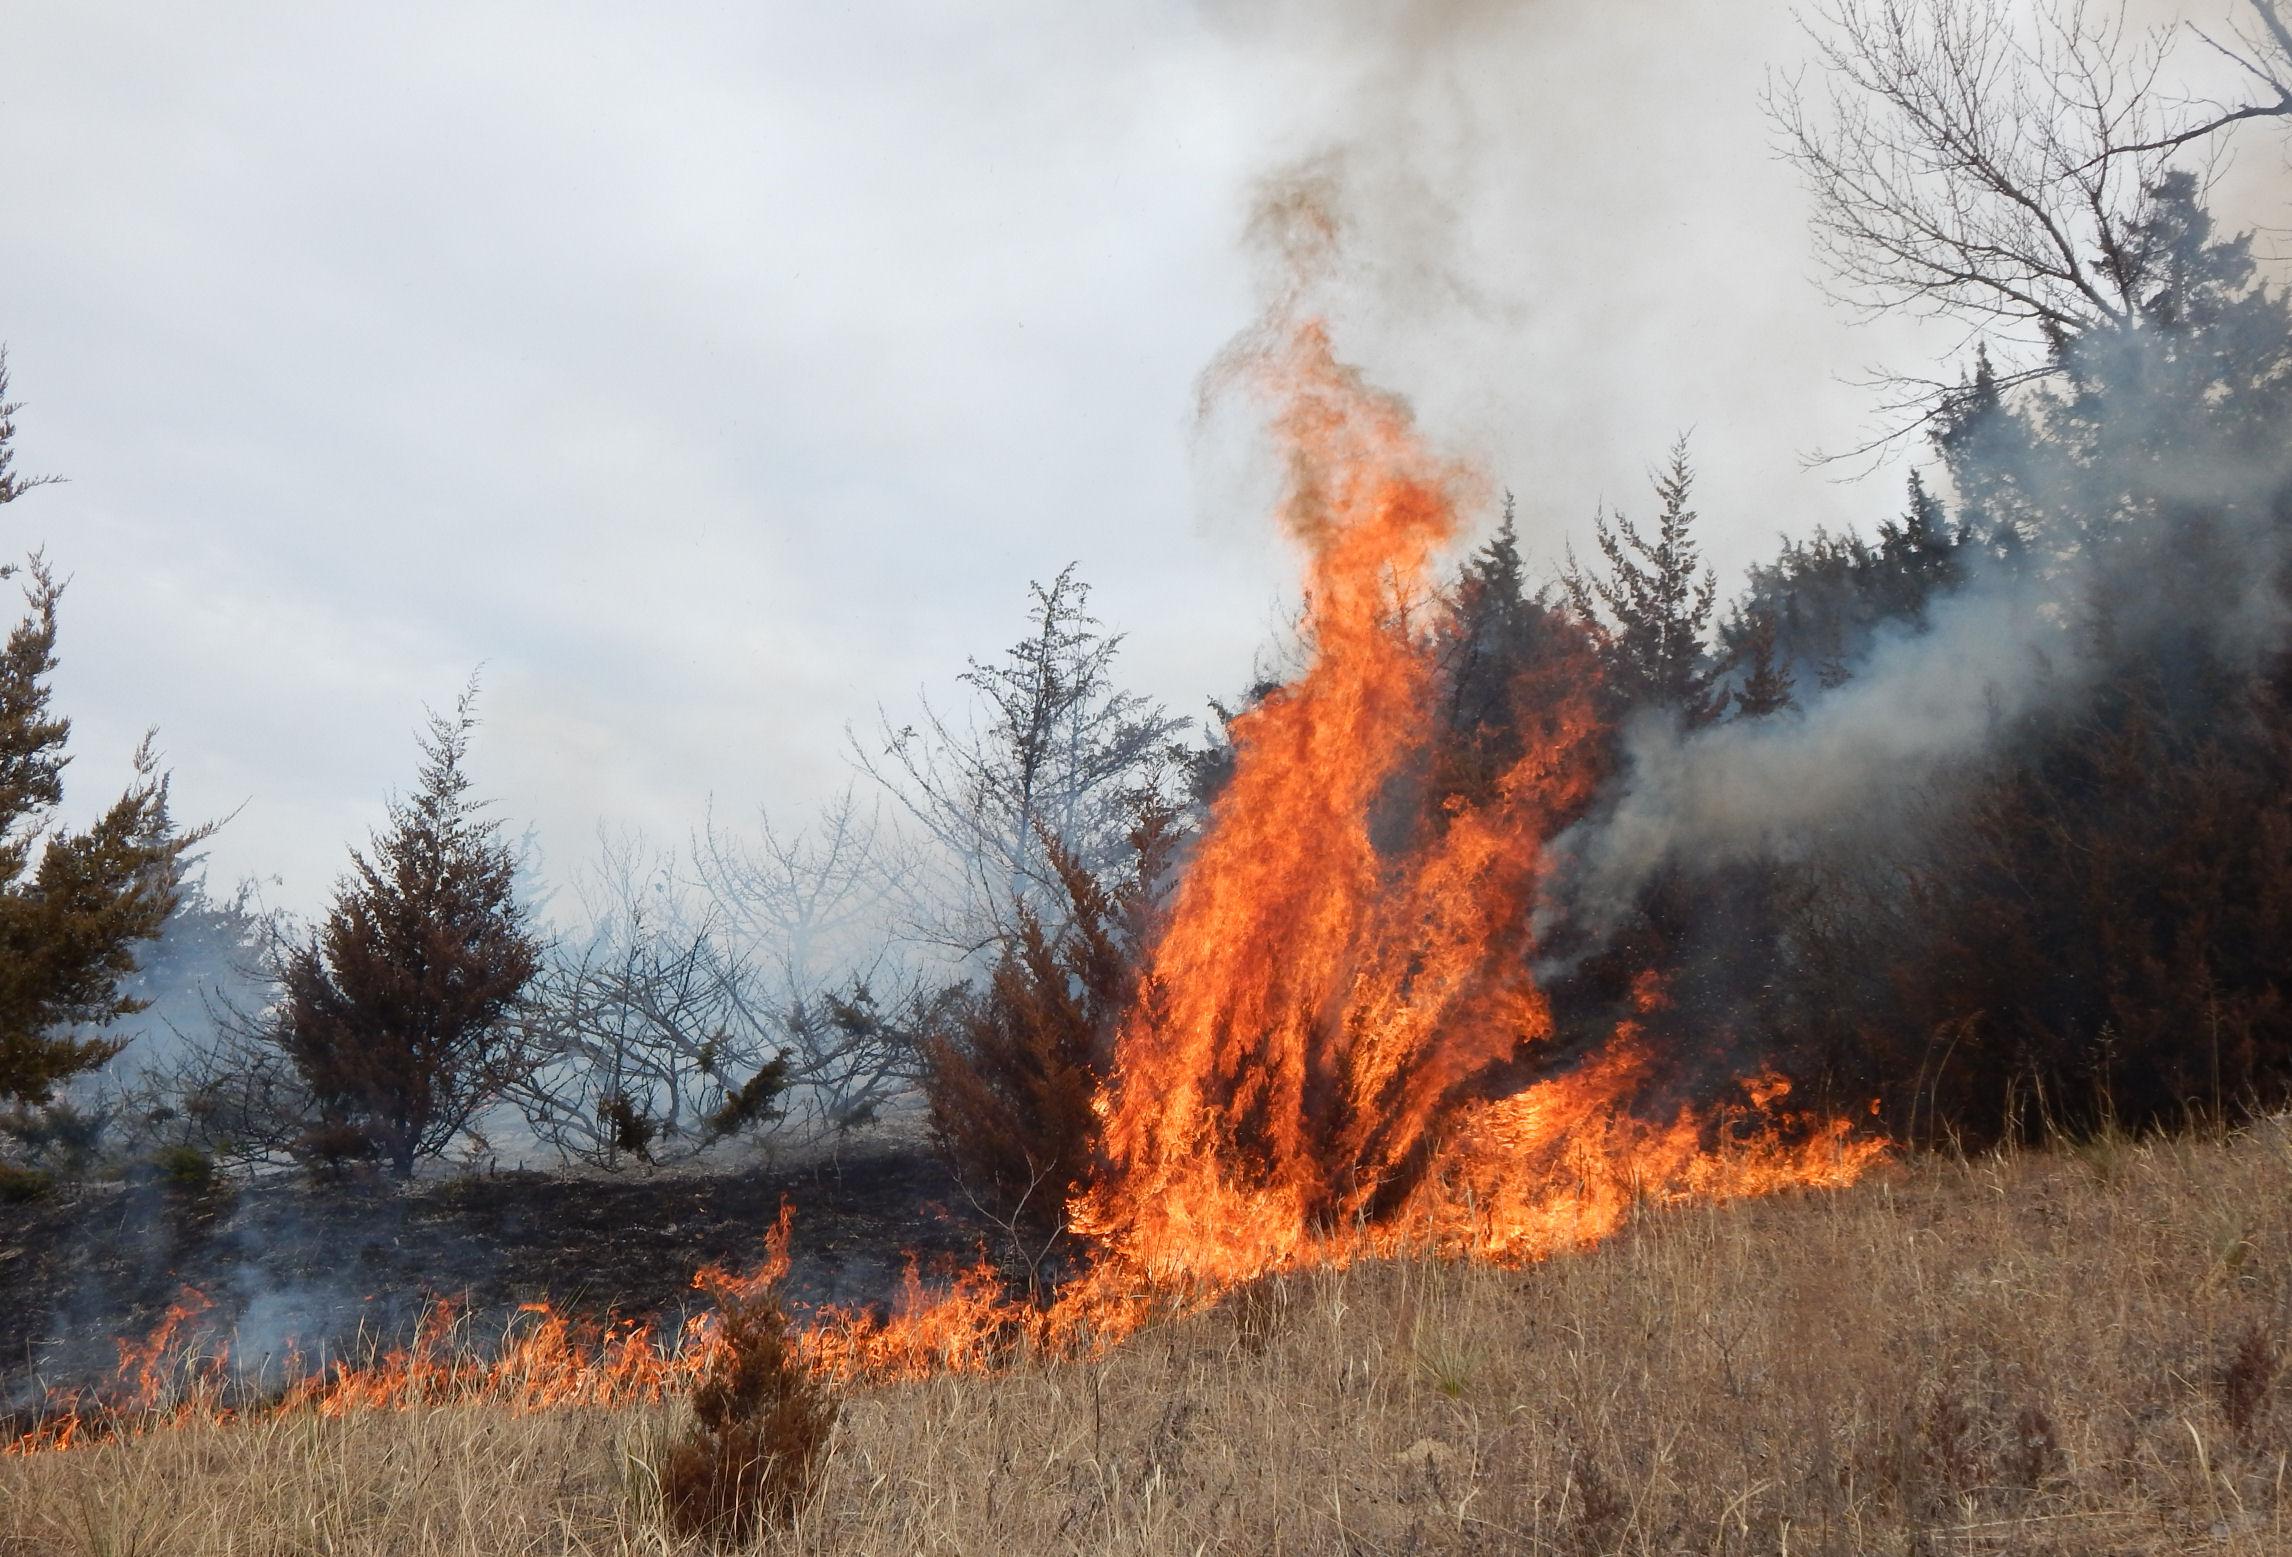 PHOTO GALLERY: Fire Burns Salina Park